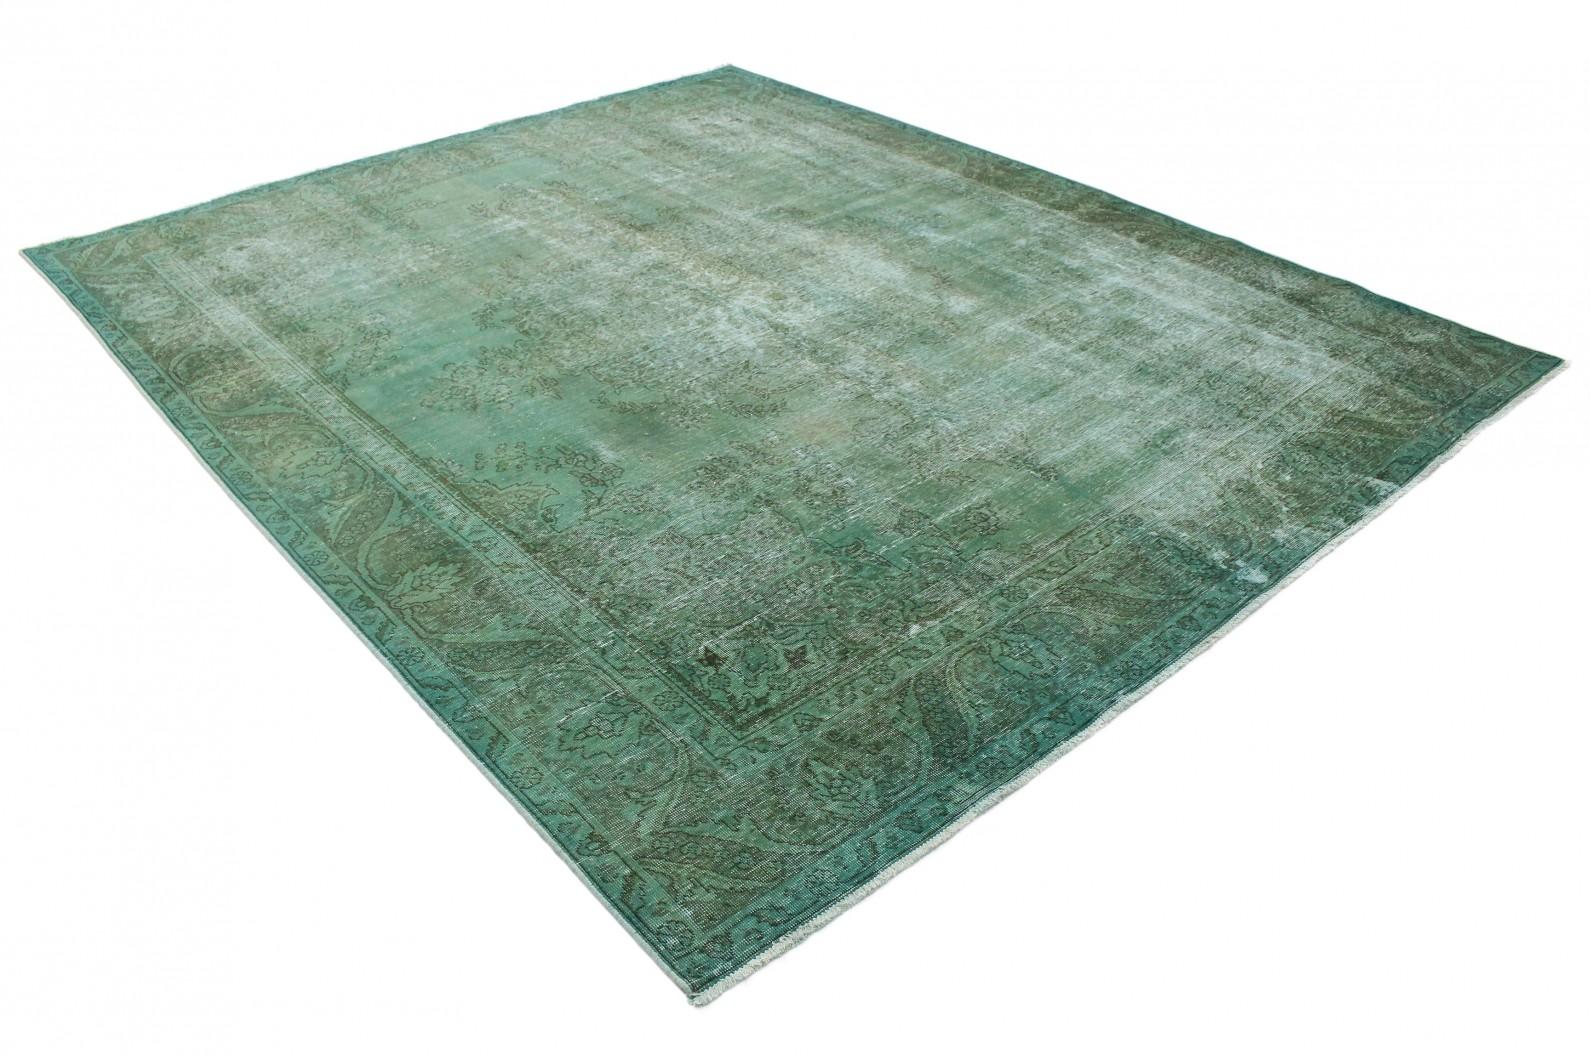 vintage teppich gr n grau in 350x290 1001 3714 bei kaufen. Black Bedroom Furniture Sets. Home Design Ideas